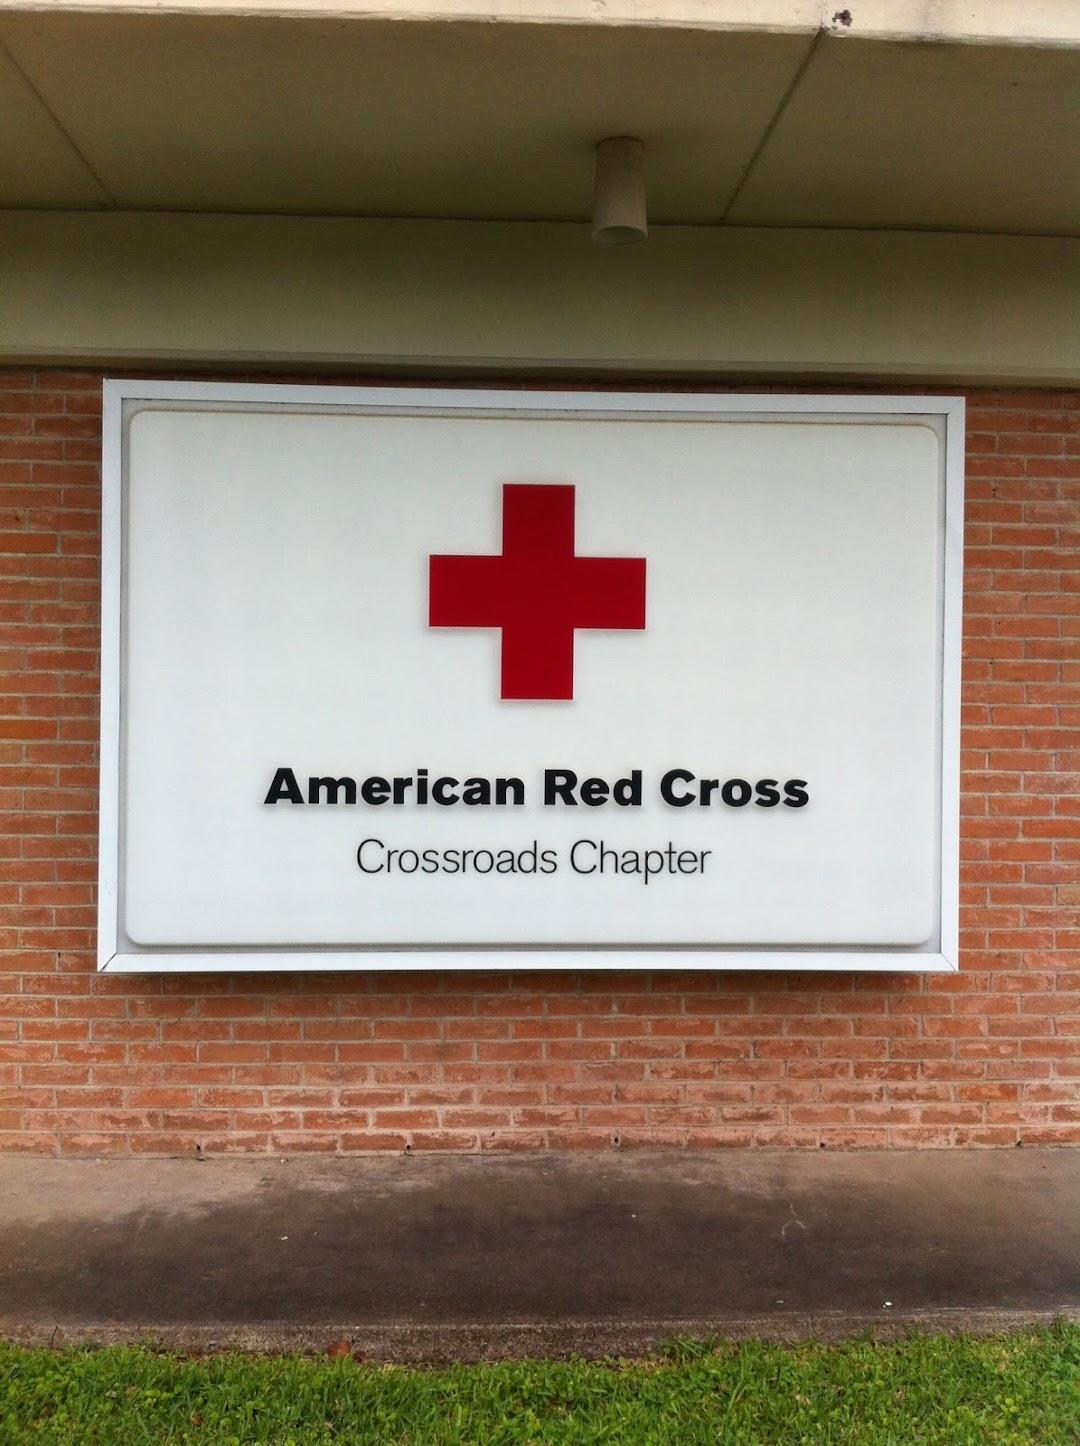 American Red Cross - Crossroads Chapter